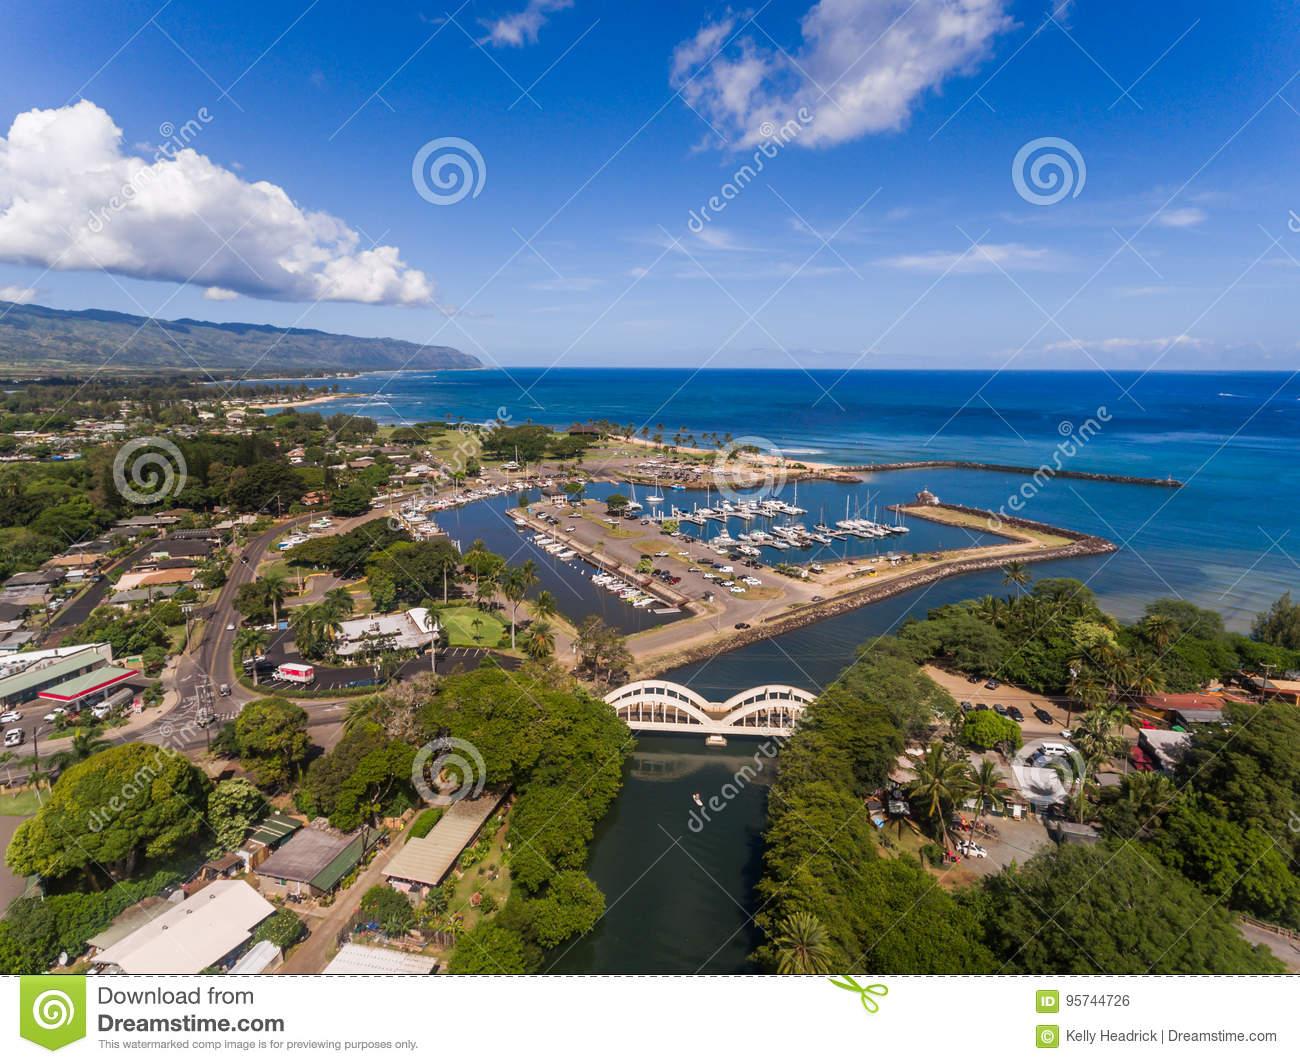 Name:  aerial-view-haleiwa-town-harbor-small-boat-anahulu-river-bridge-95744726.jpg Views: 927 Size:  241.9 KB